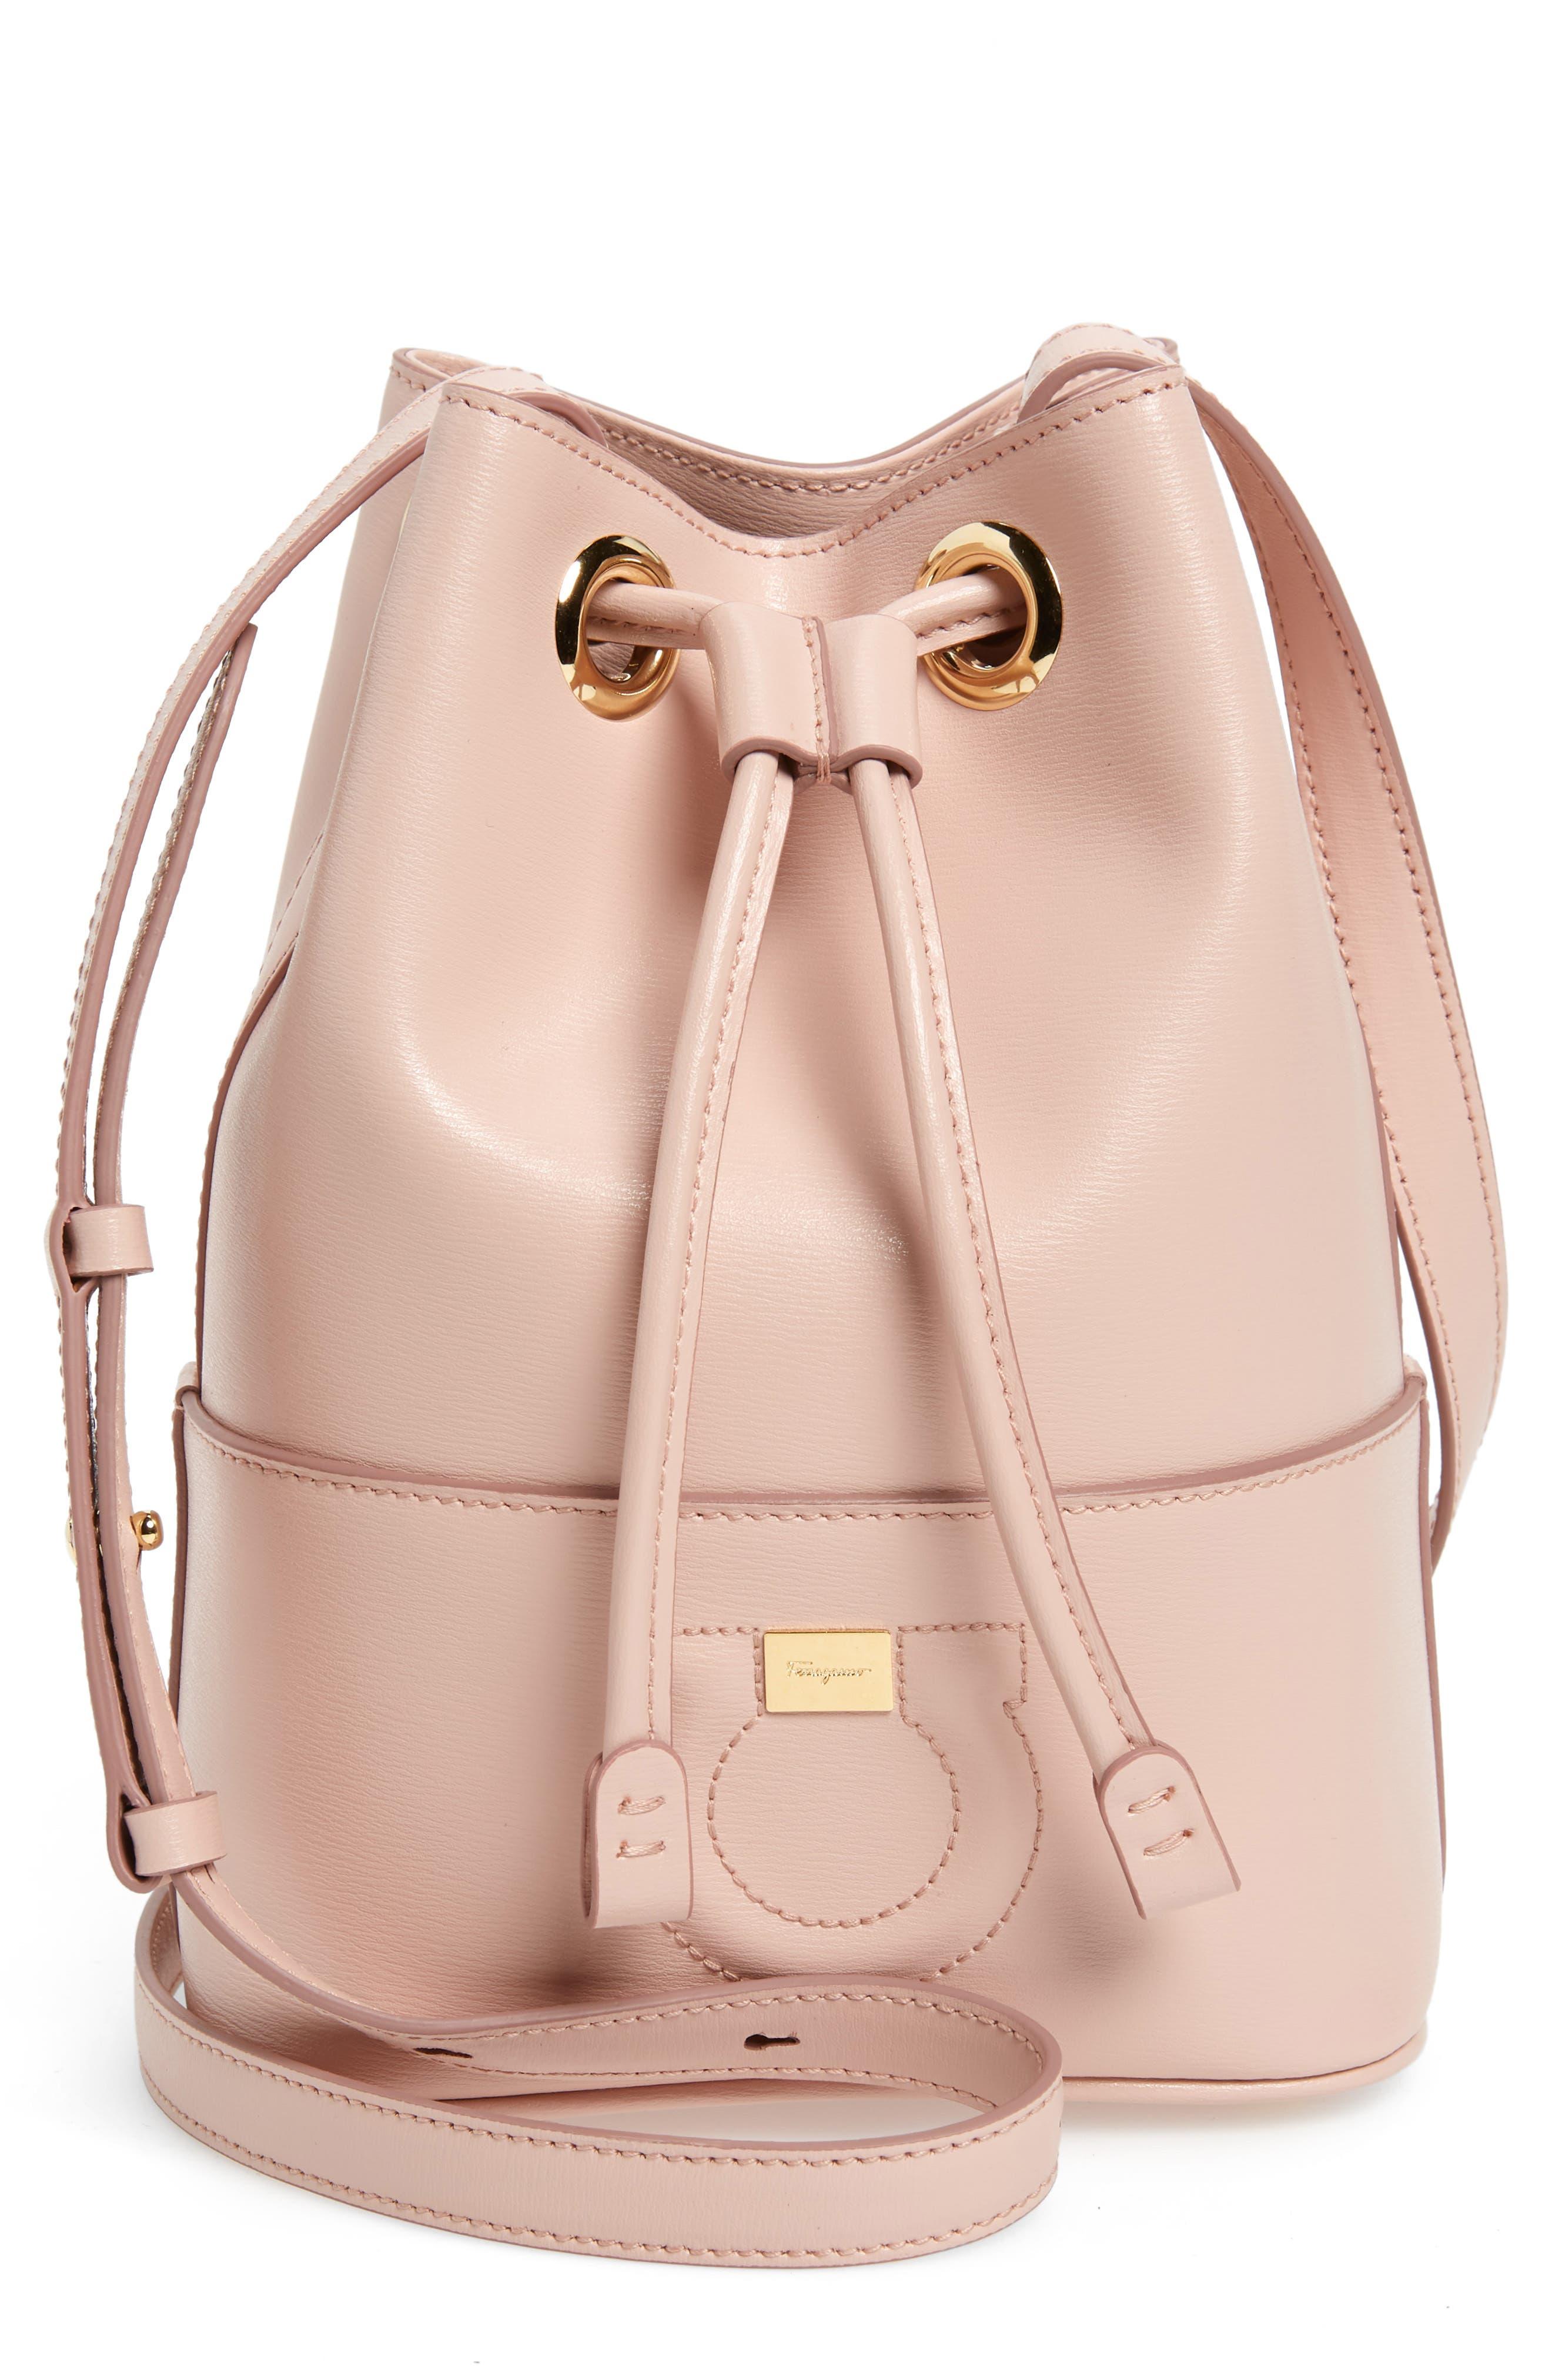 cc9d081eaf4 Salvatore Ferragamo City Quilted Gancio Bucket Bag - Pink In Bon Bon Pink